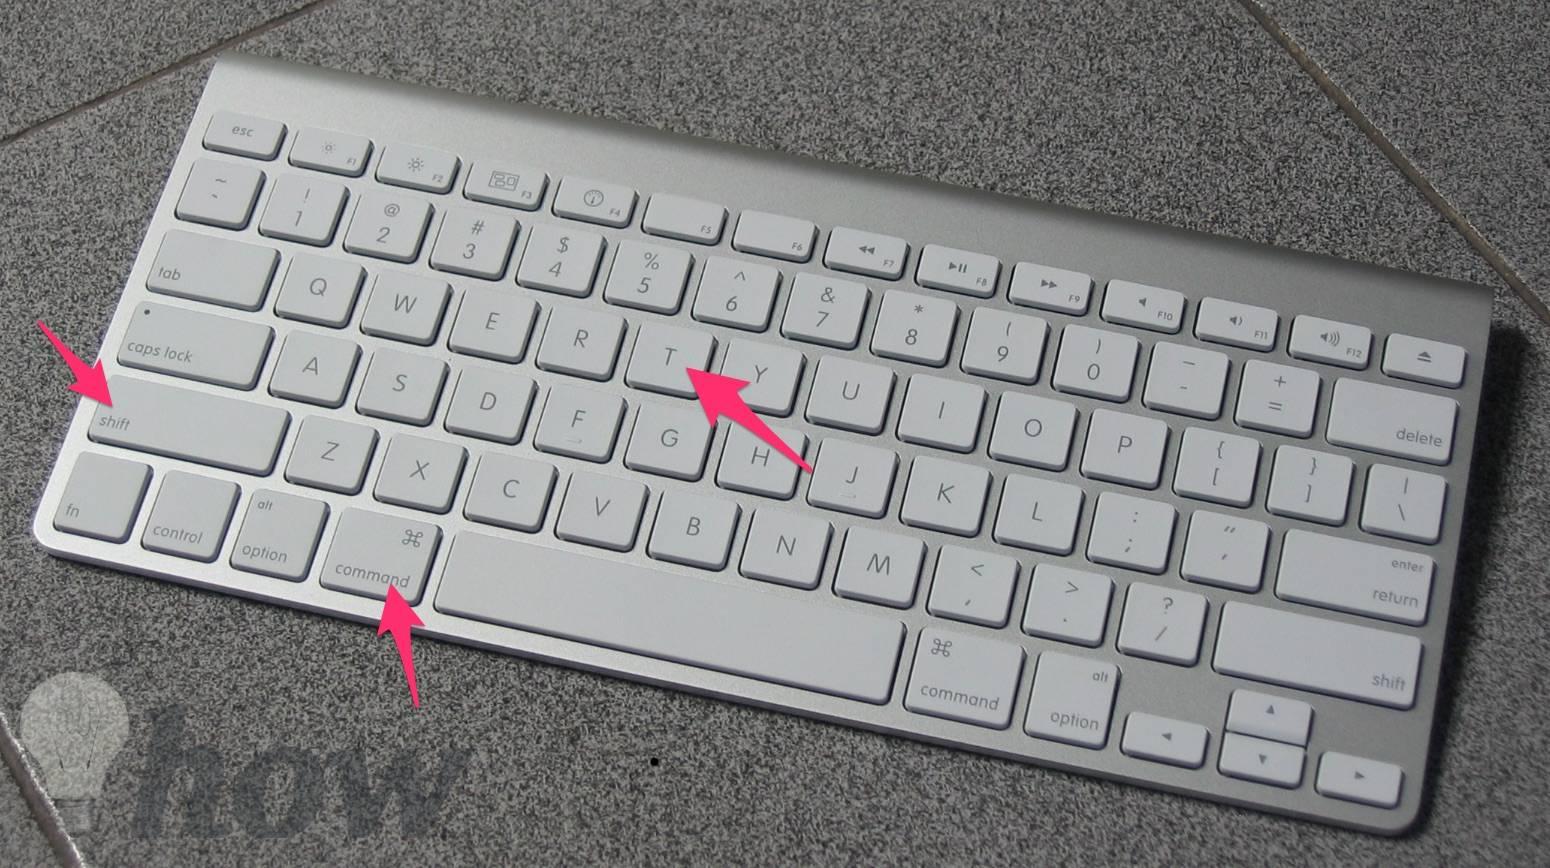 Switch Between Sheets In Excel Keyboard Shortcut Mac